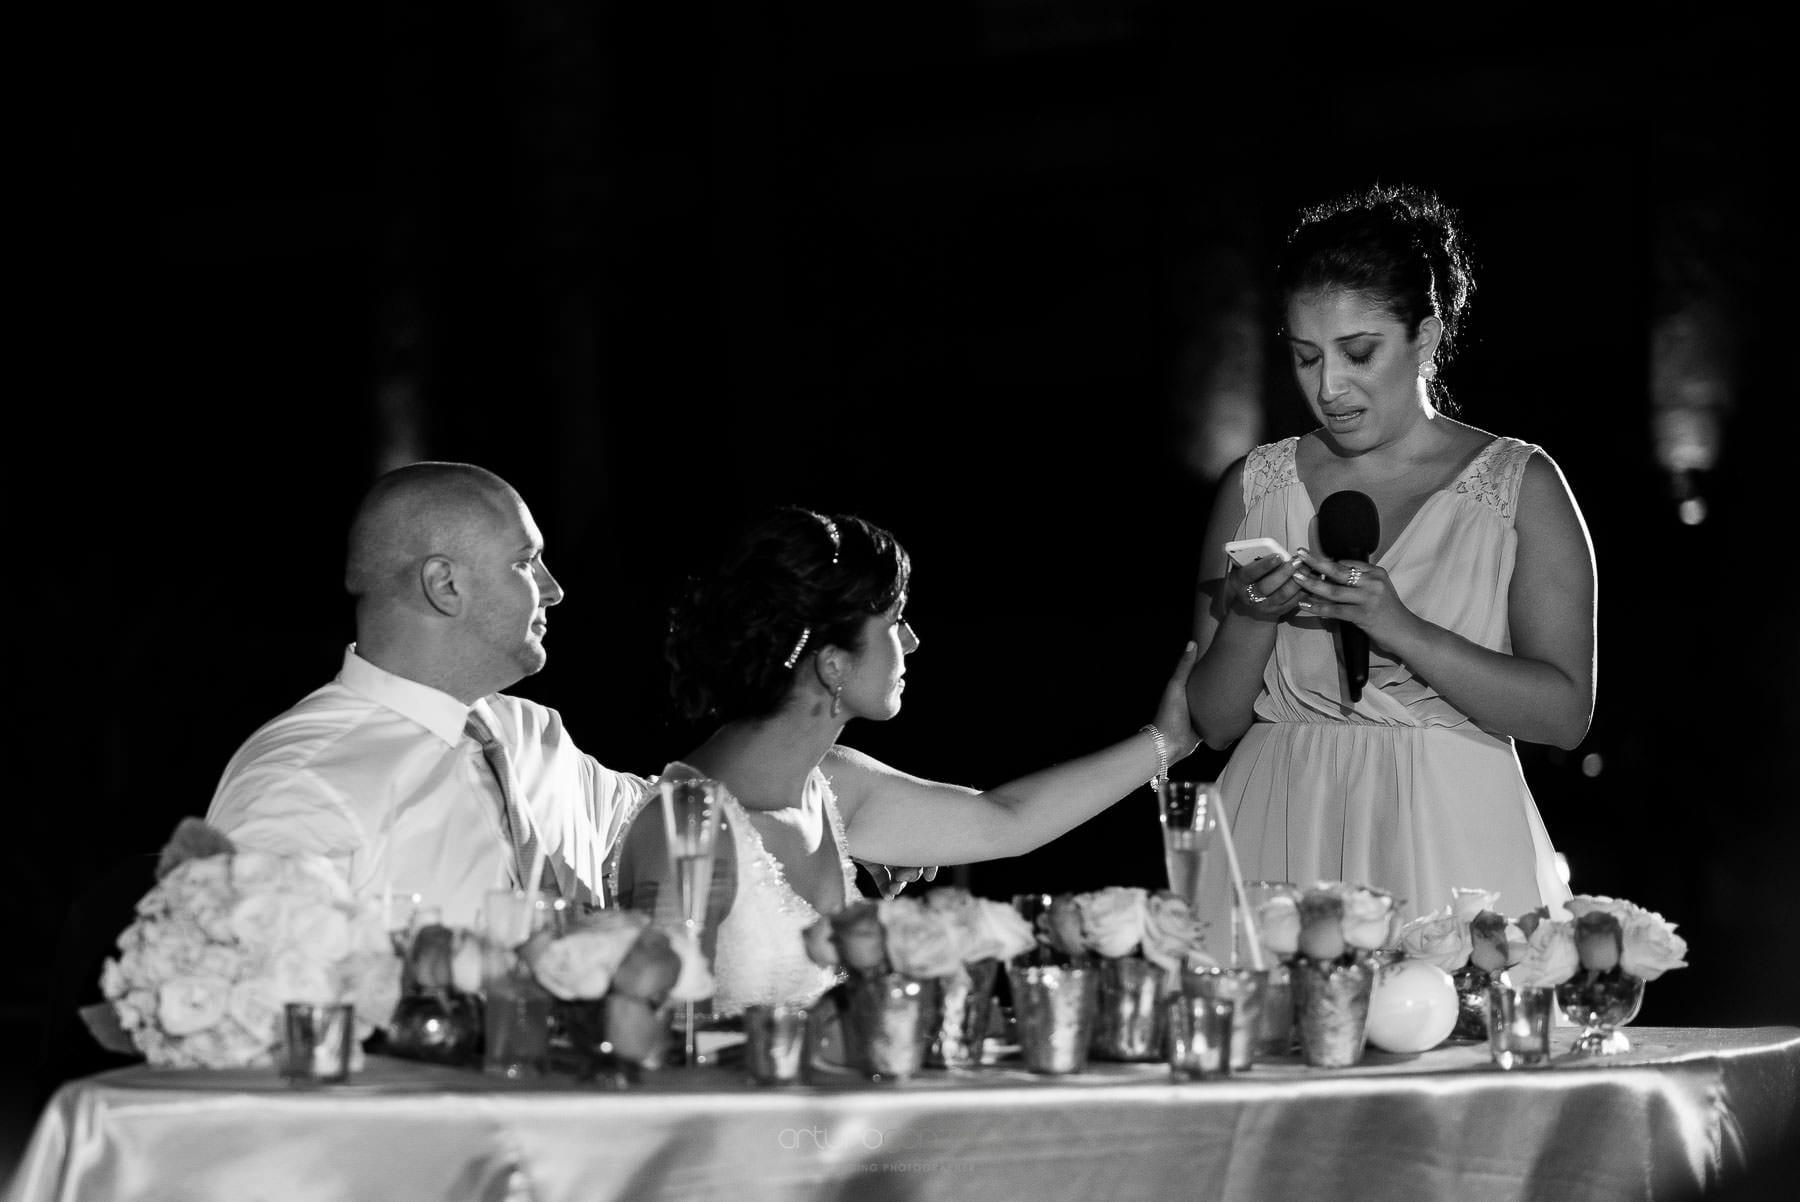 wedding-photos-pueblo-bonito-sunset-beach-4634